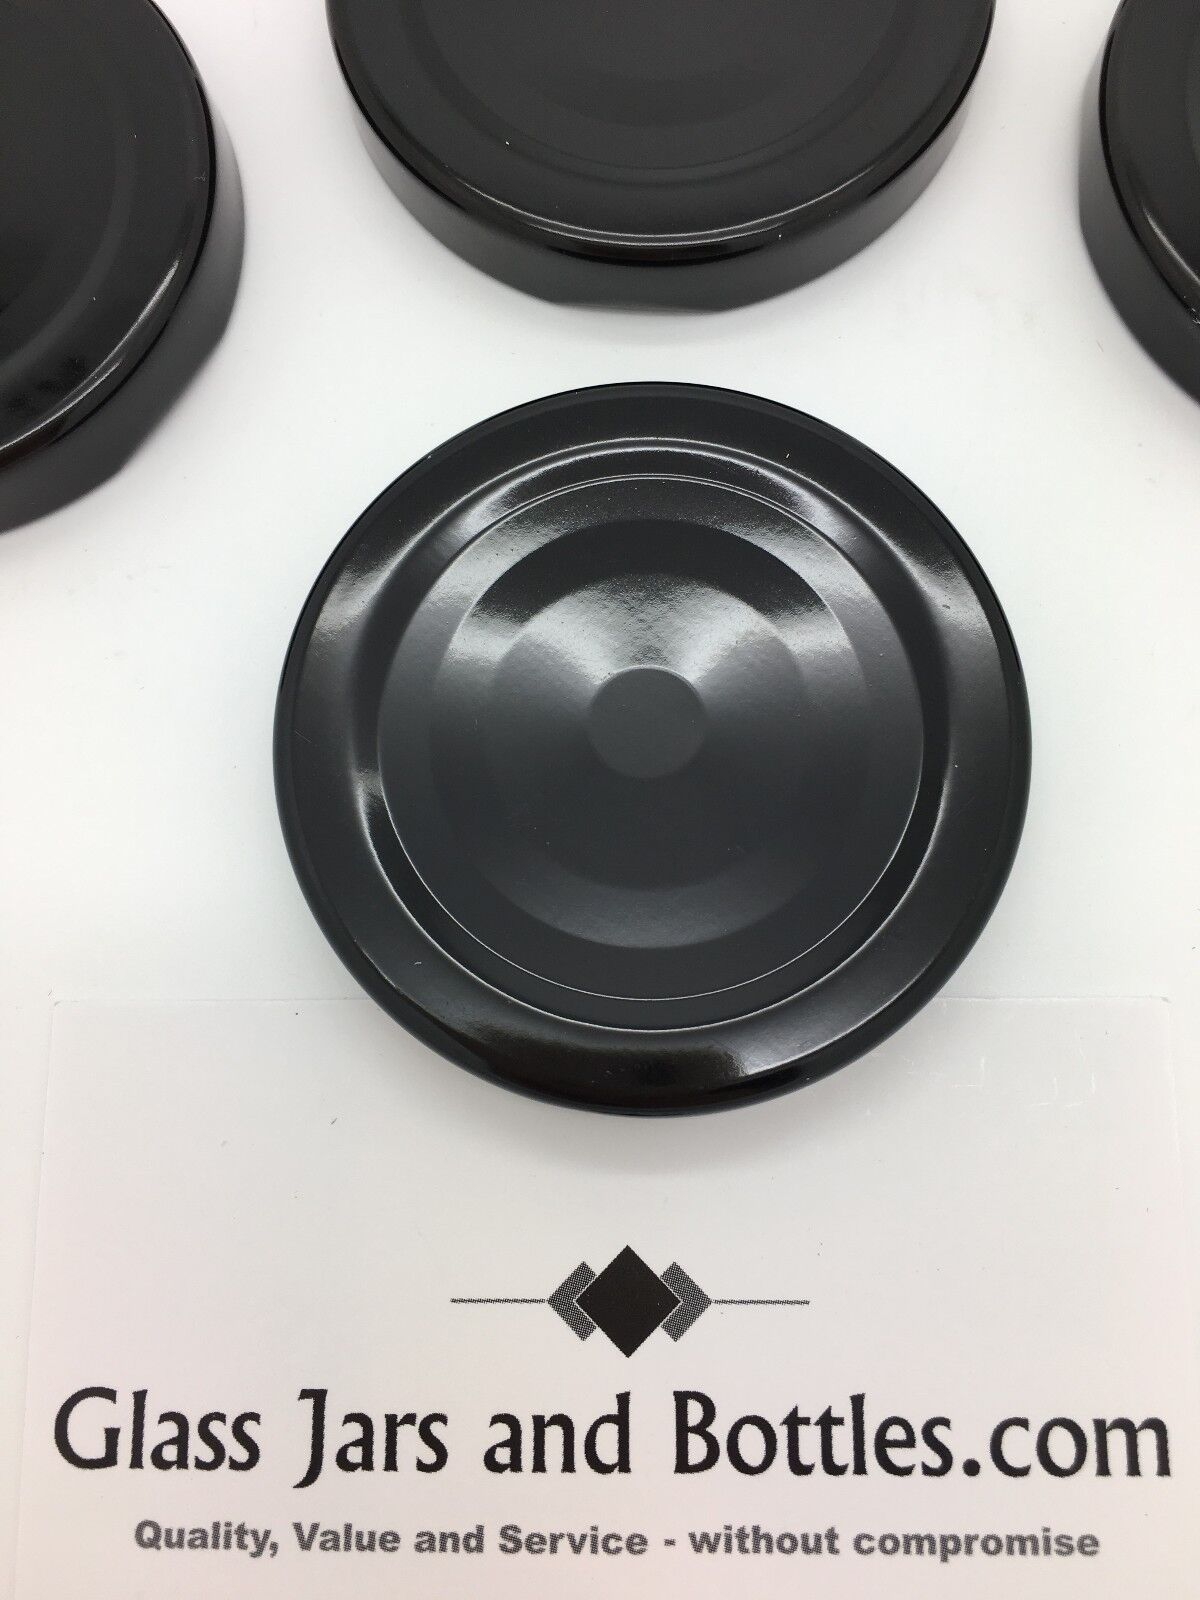 Hexagonal Glass Jam Pots 45 ml mariage faveurs, préserve-Choix préserve-Choix préserve-Choix de 43 mm Couvercles f6aa6b